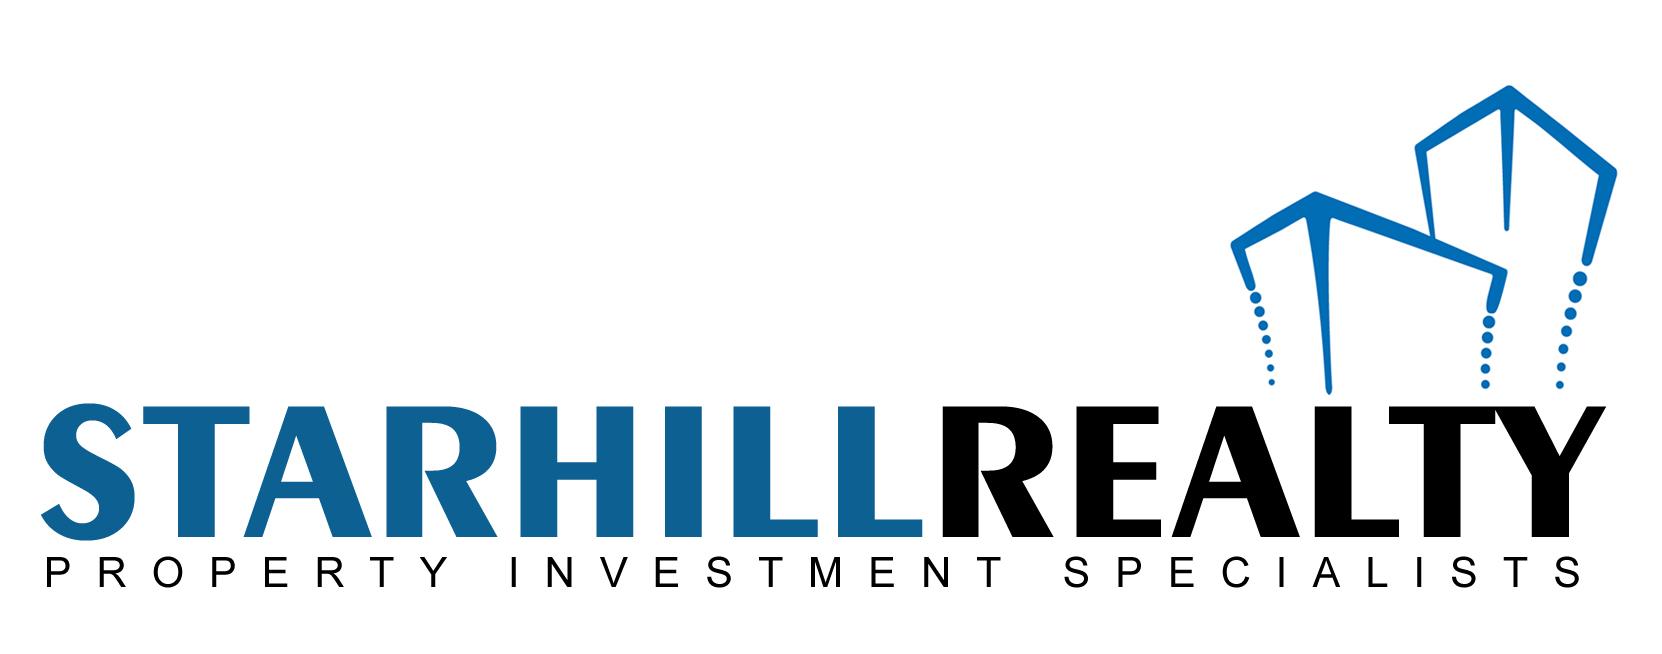 Starhill Realty Ltd (UK) Logo